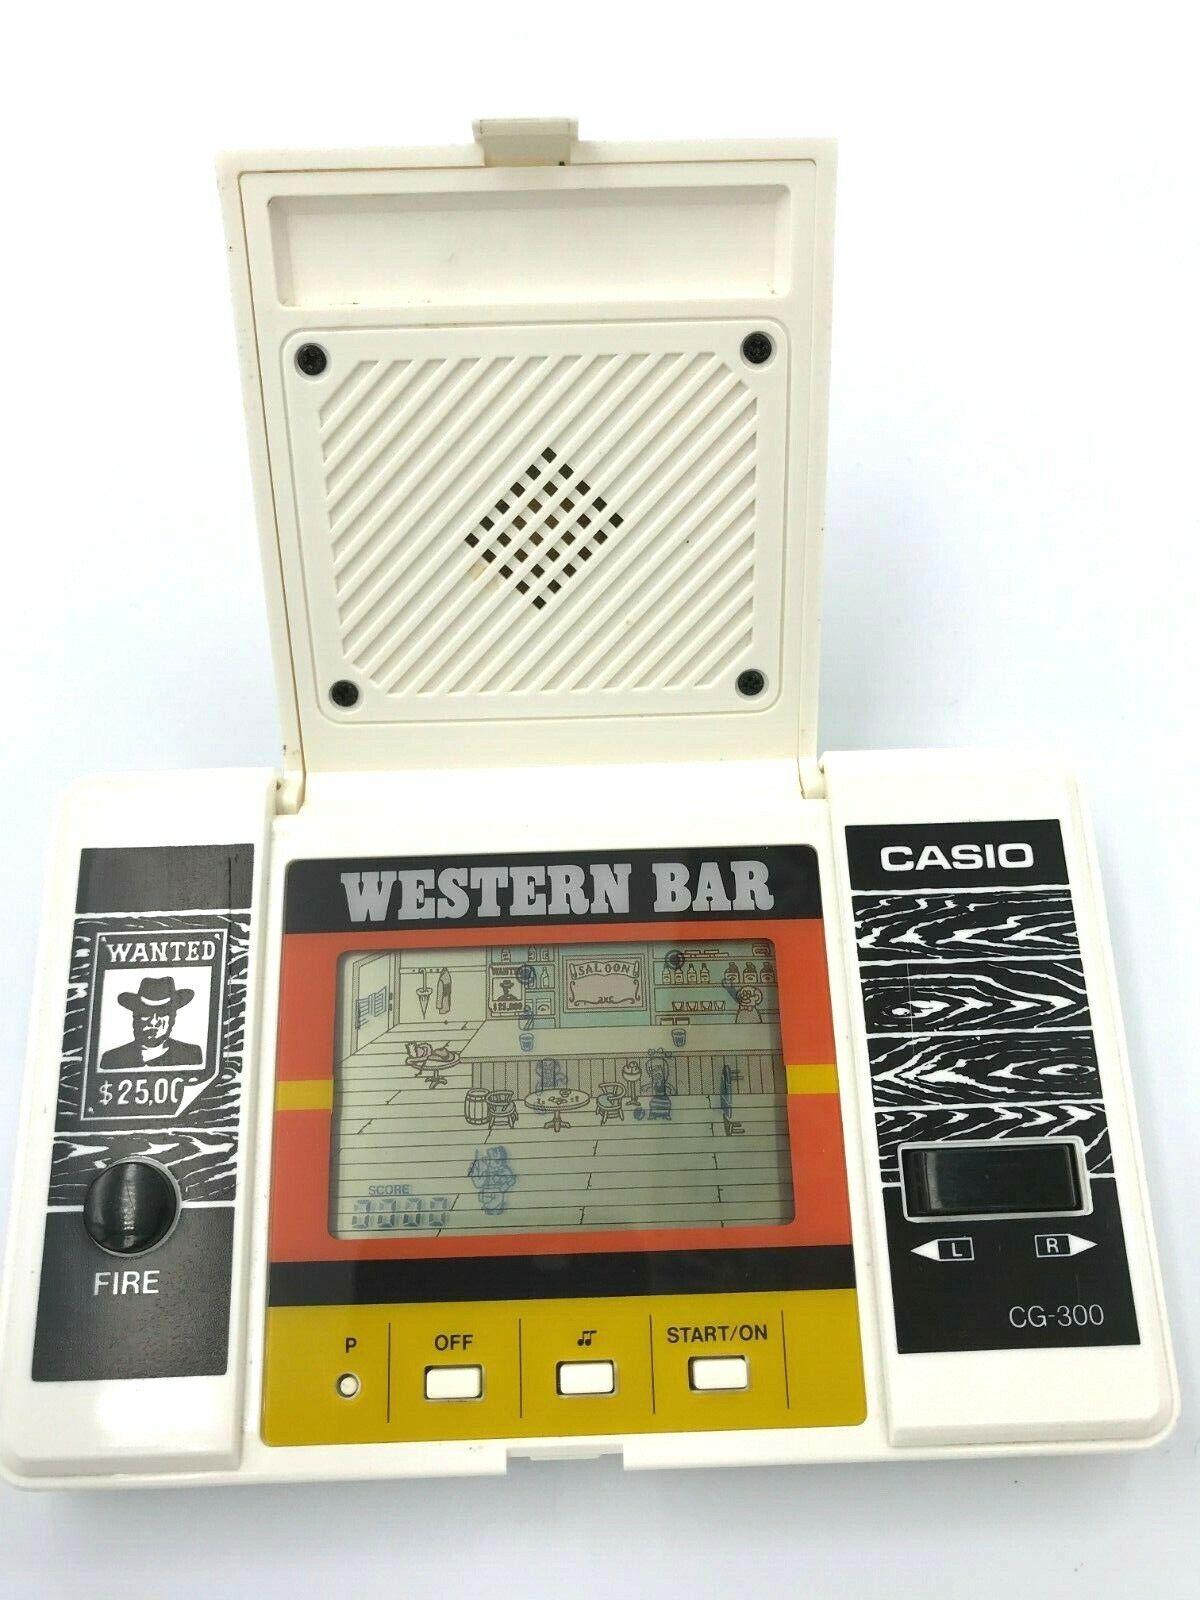 Casio Western Bar CG-300 Handhållen LCD Spel Klassisk retro HandName